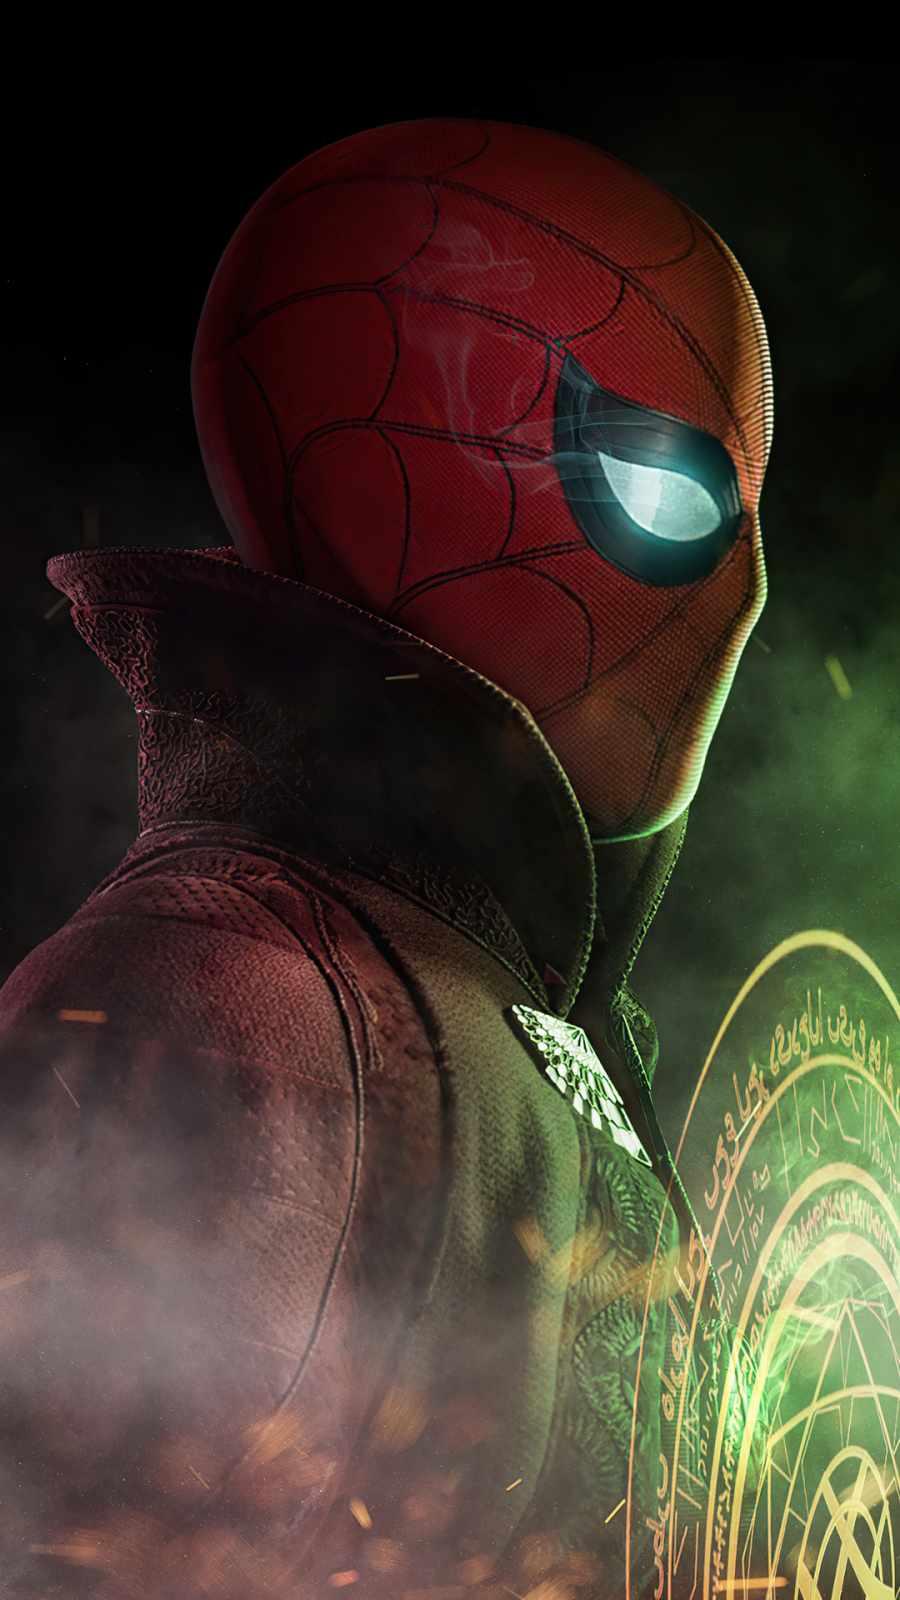 Spiderman x doctor strange